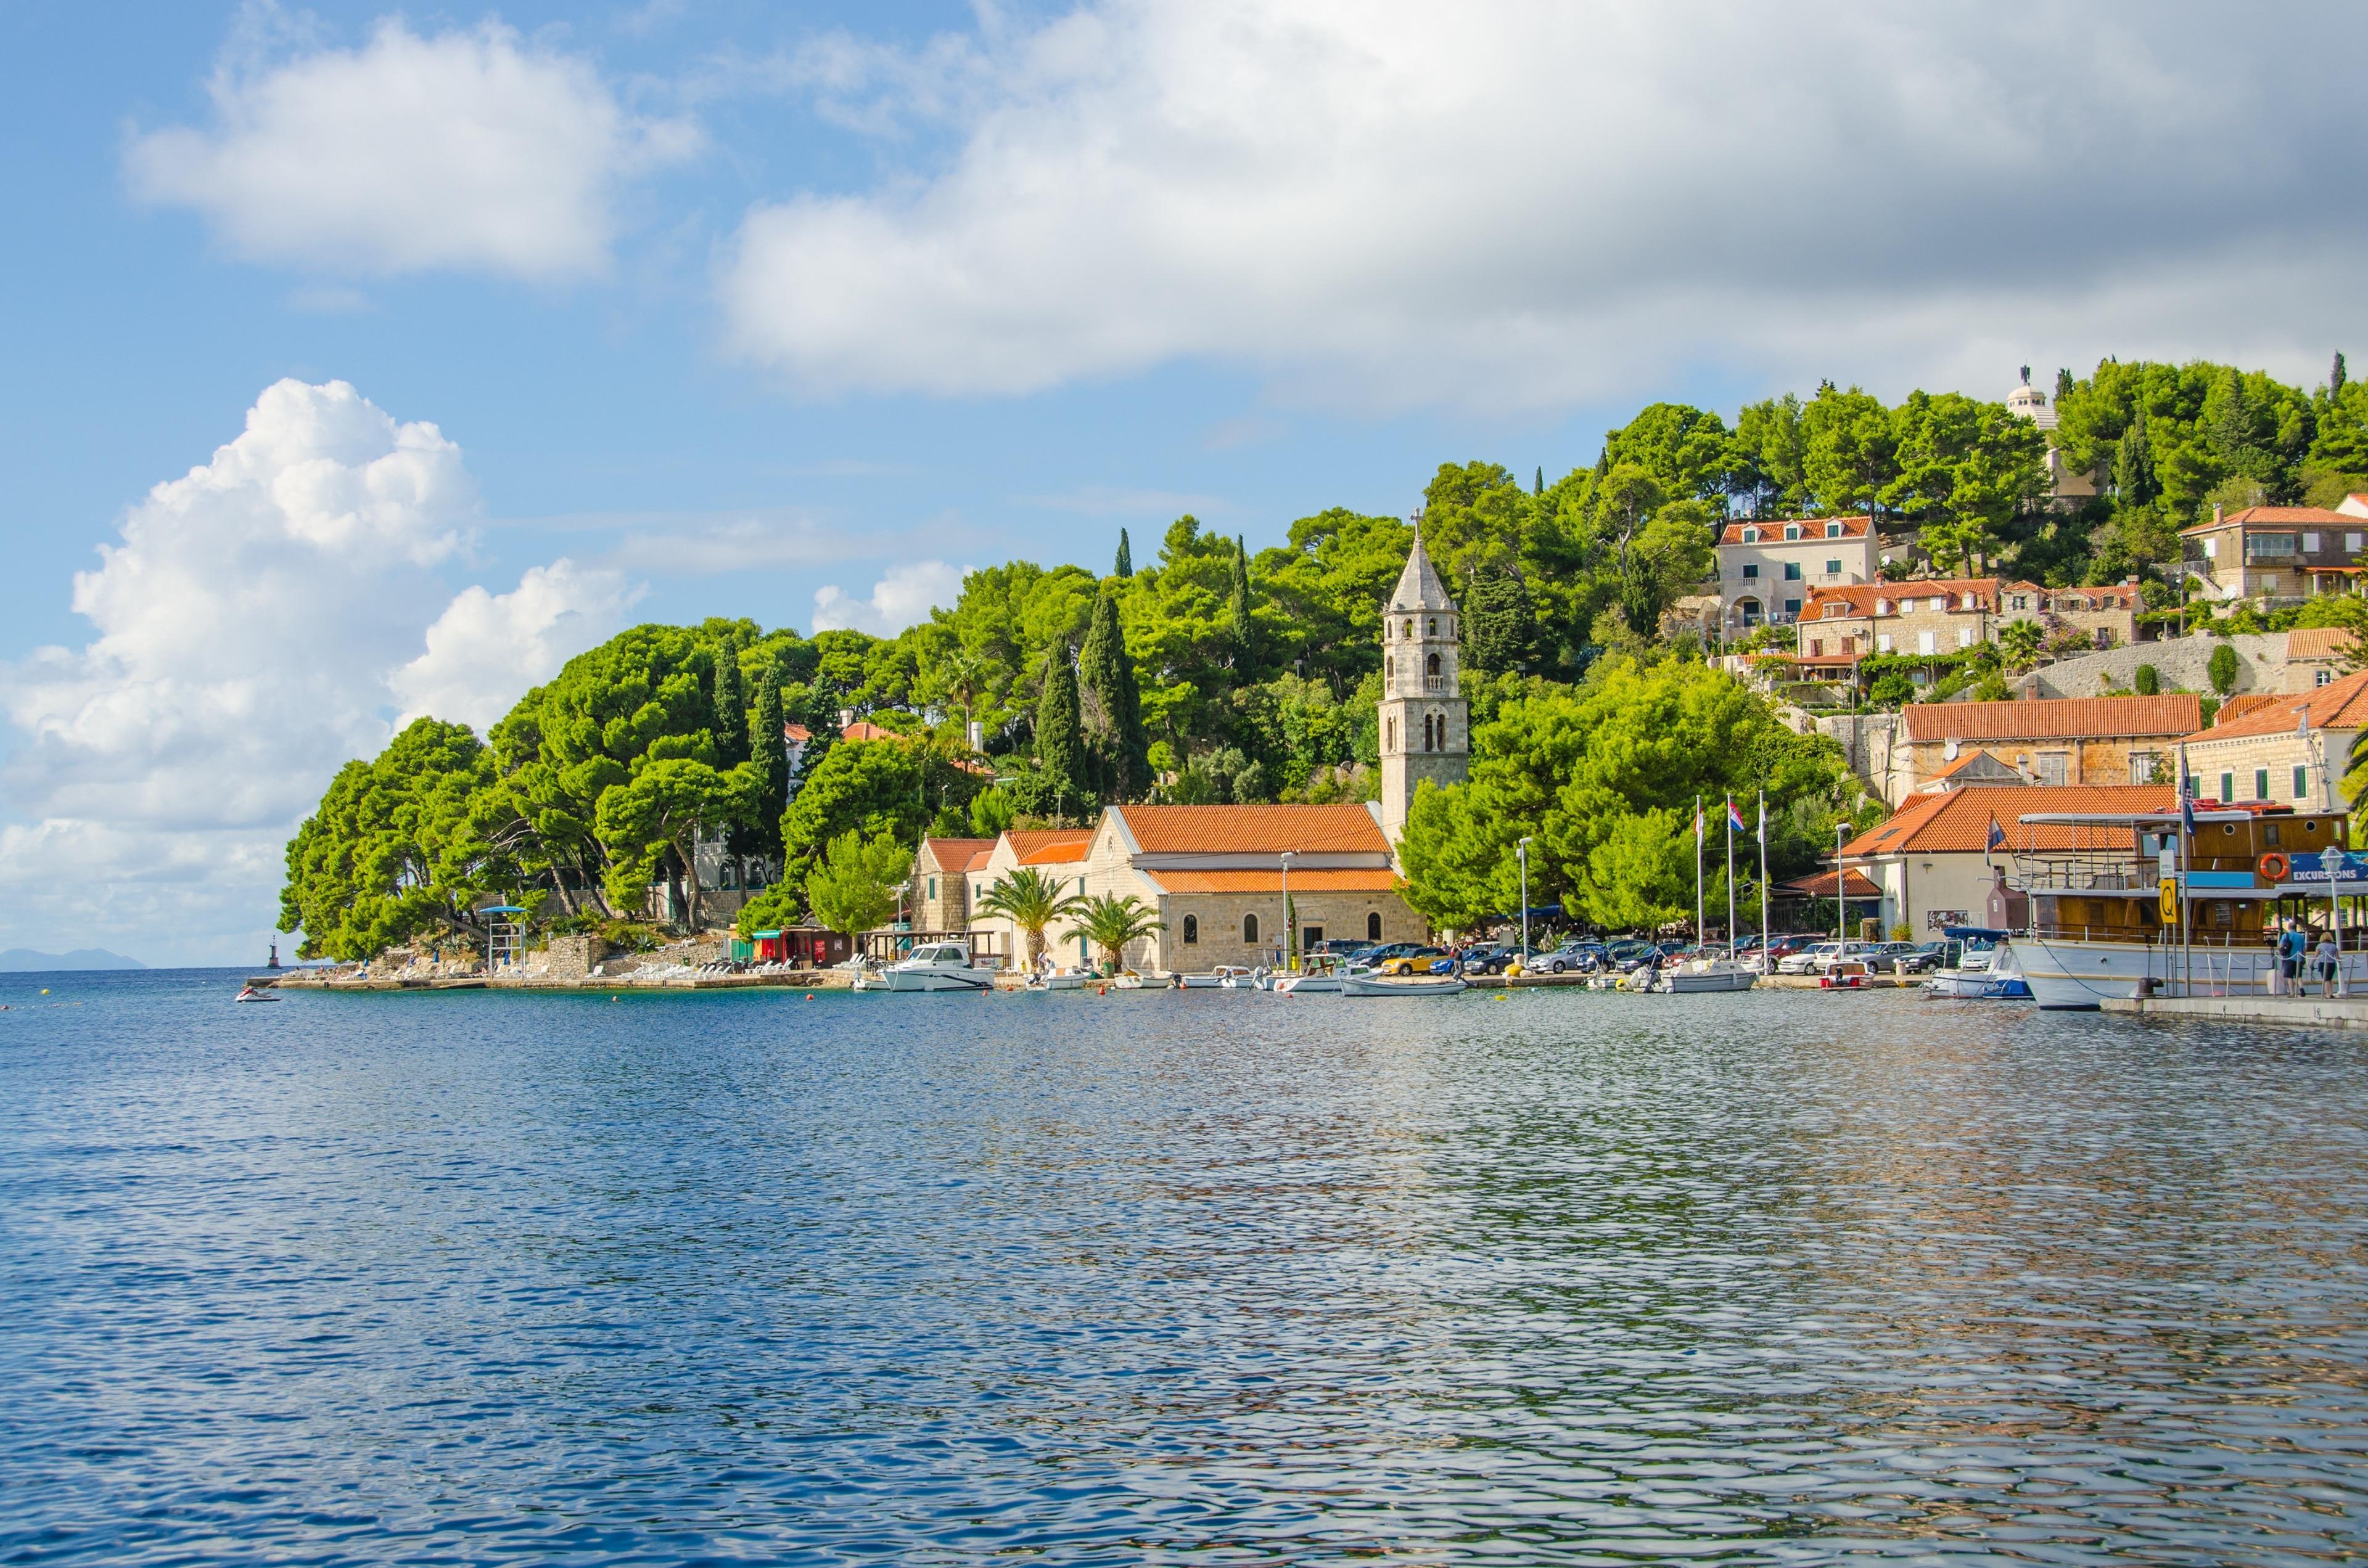 Cavtat, Konavle, Dubrovnik-Neretva, Croatia